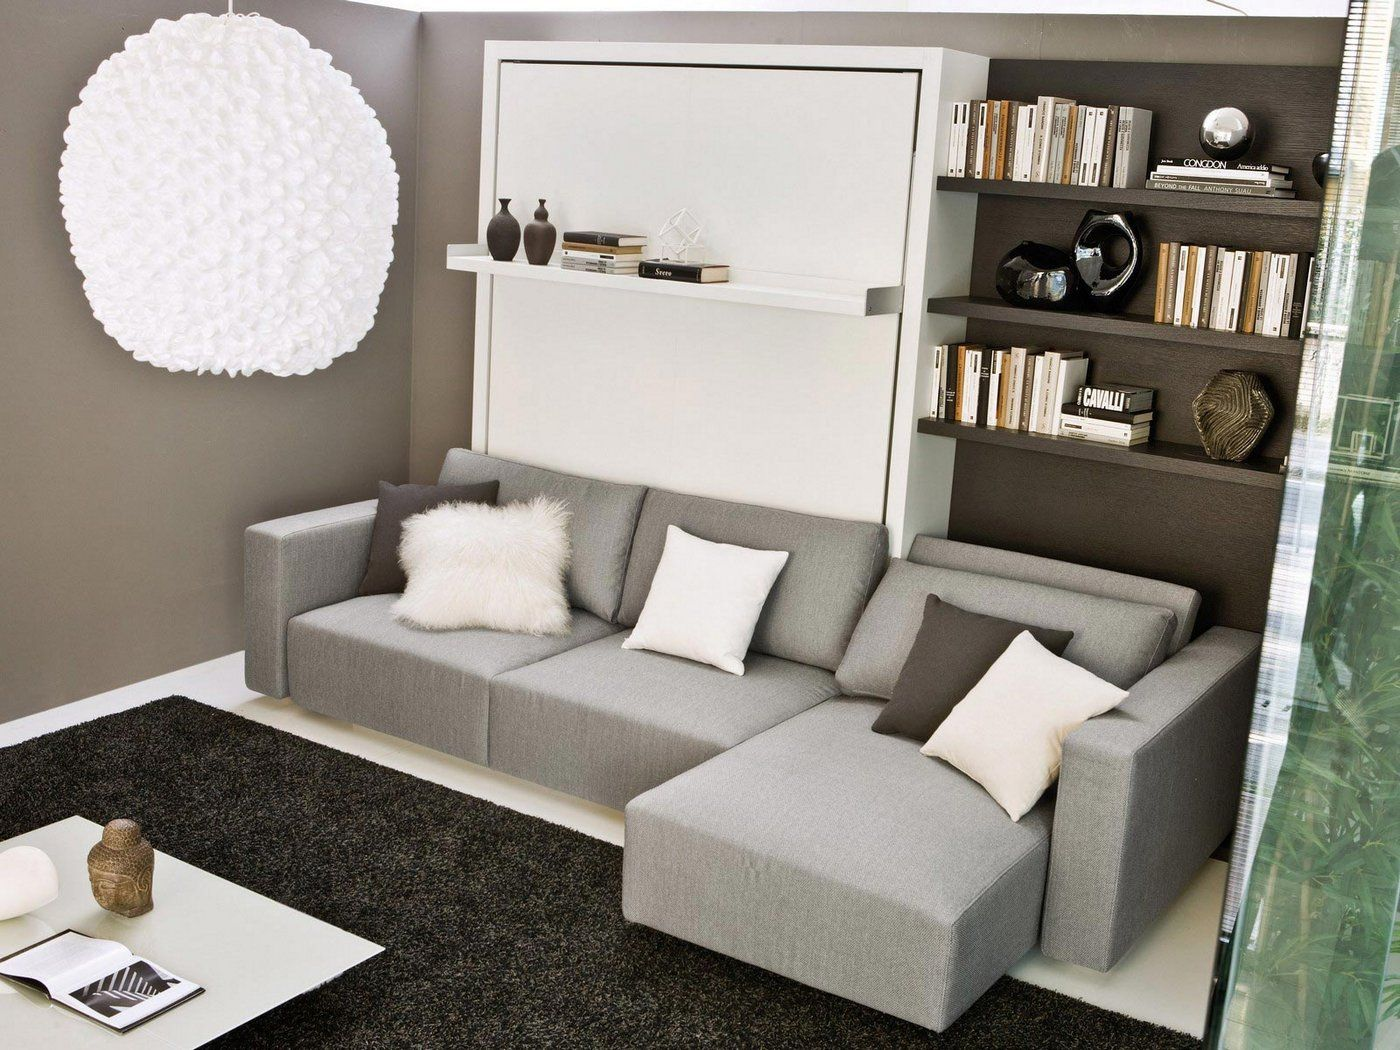 Sleek murphy bed next to open shelving small room ideas